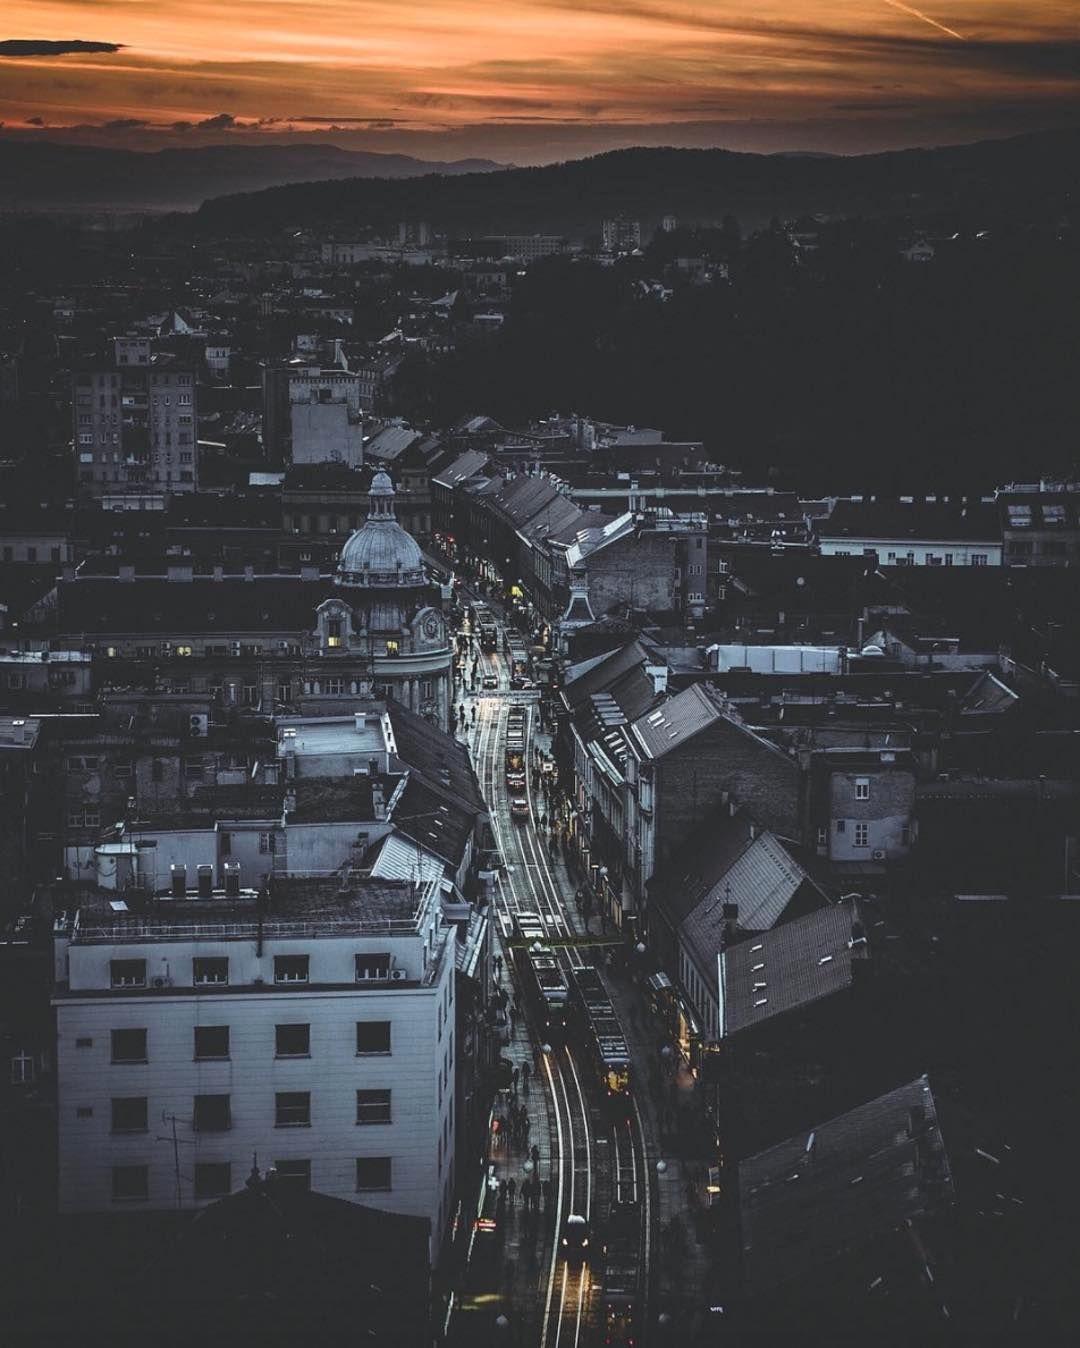 Gefallt 95 3 Tsd Mal 539 Kommentare Beautiful Destinations Beautifuldestinations Auf Instagram A Night In Cro Beautiful Destinations Croatia Instagram